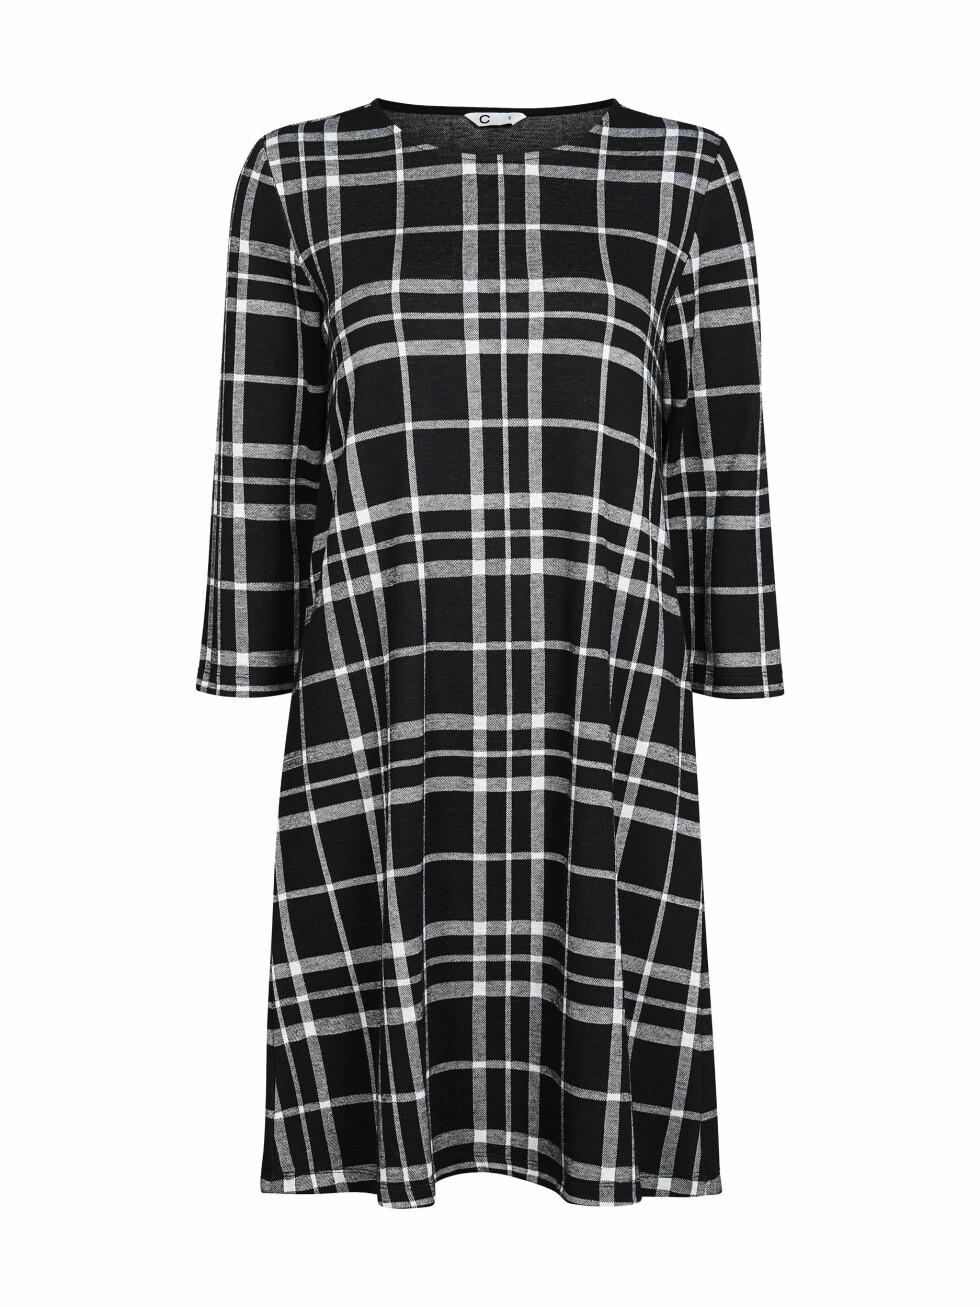 Rutete kjole (kr 300, Cubus).